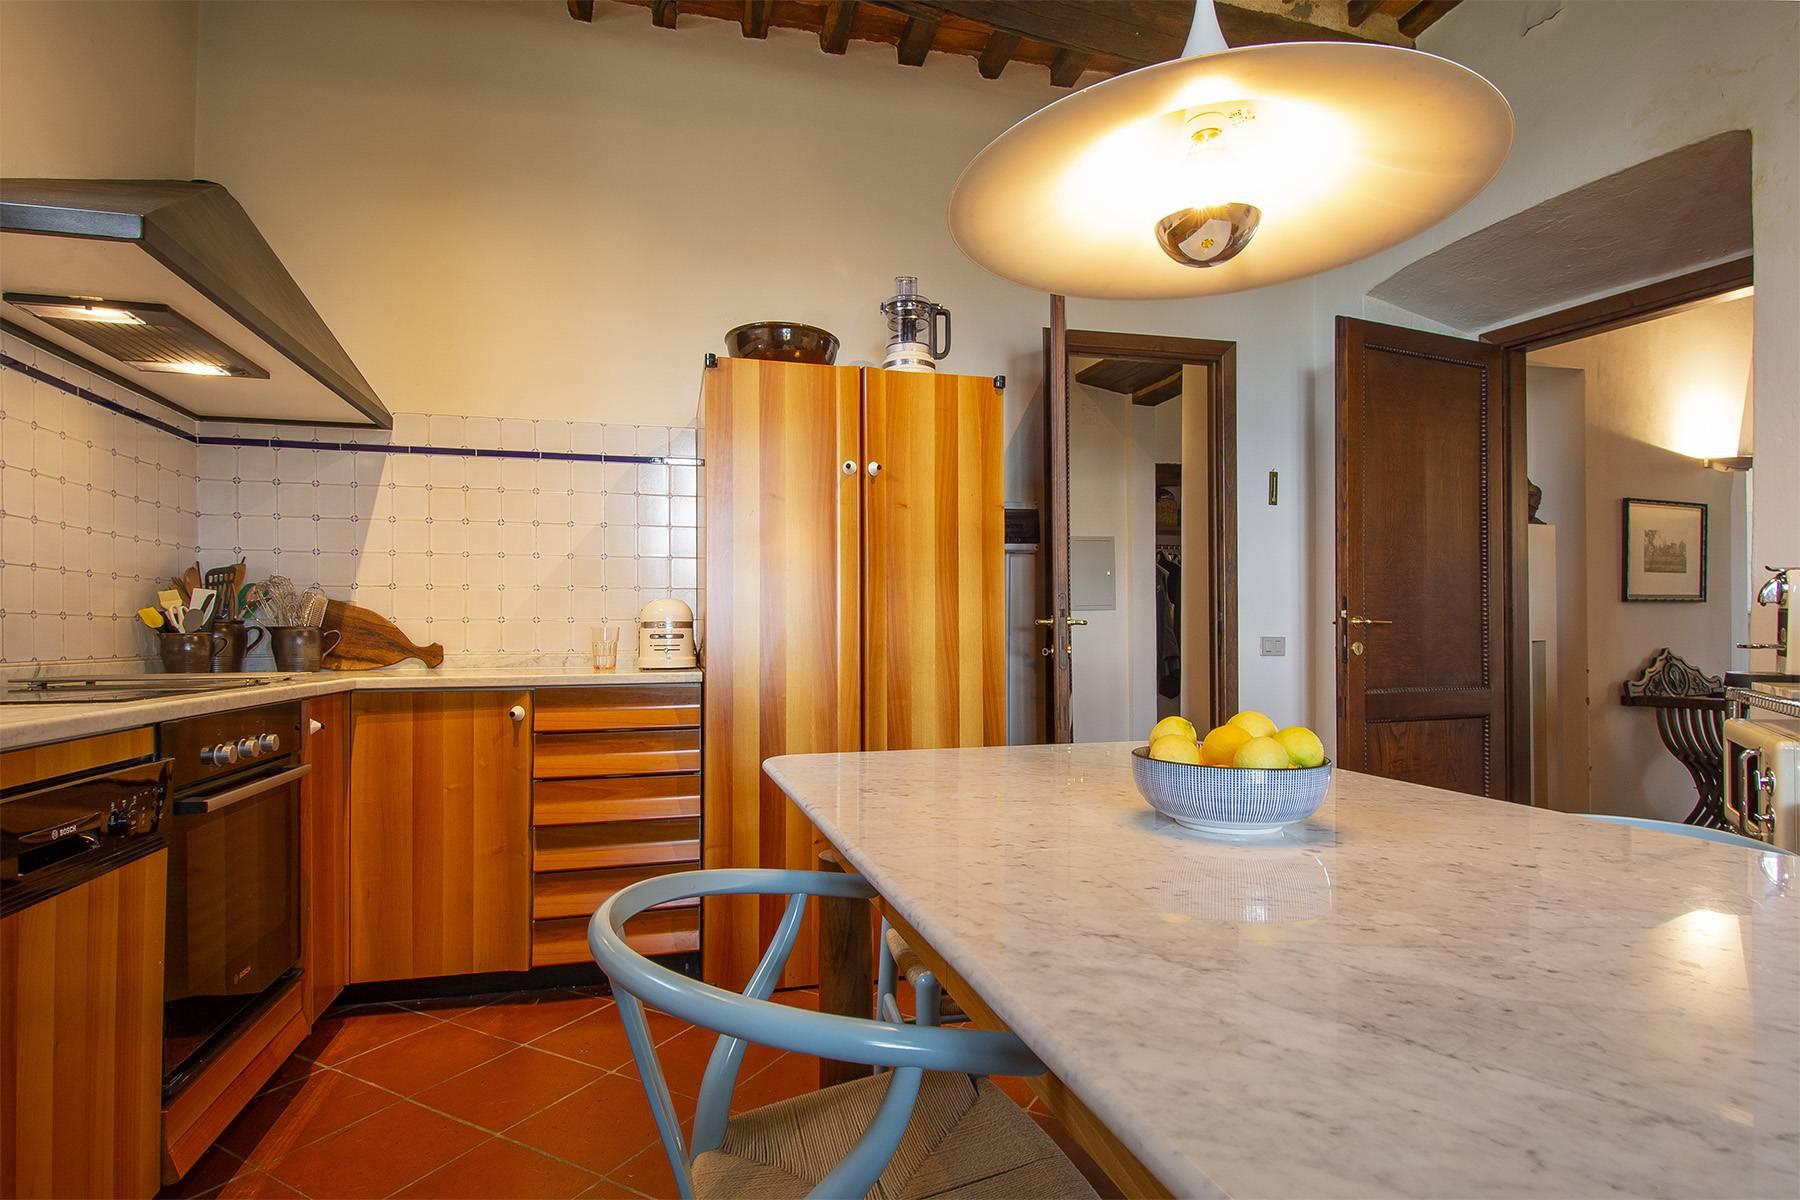 Villa in Vendita a Capannori: 5 locali, 380 mq - Foto 15